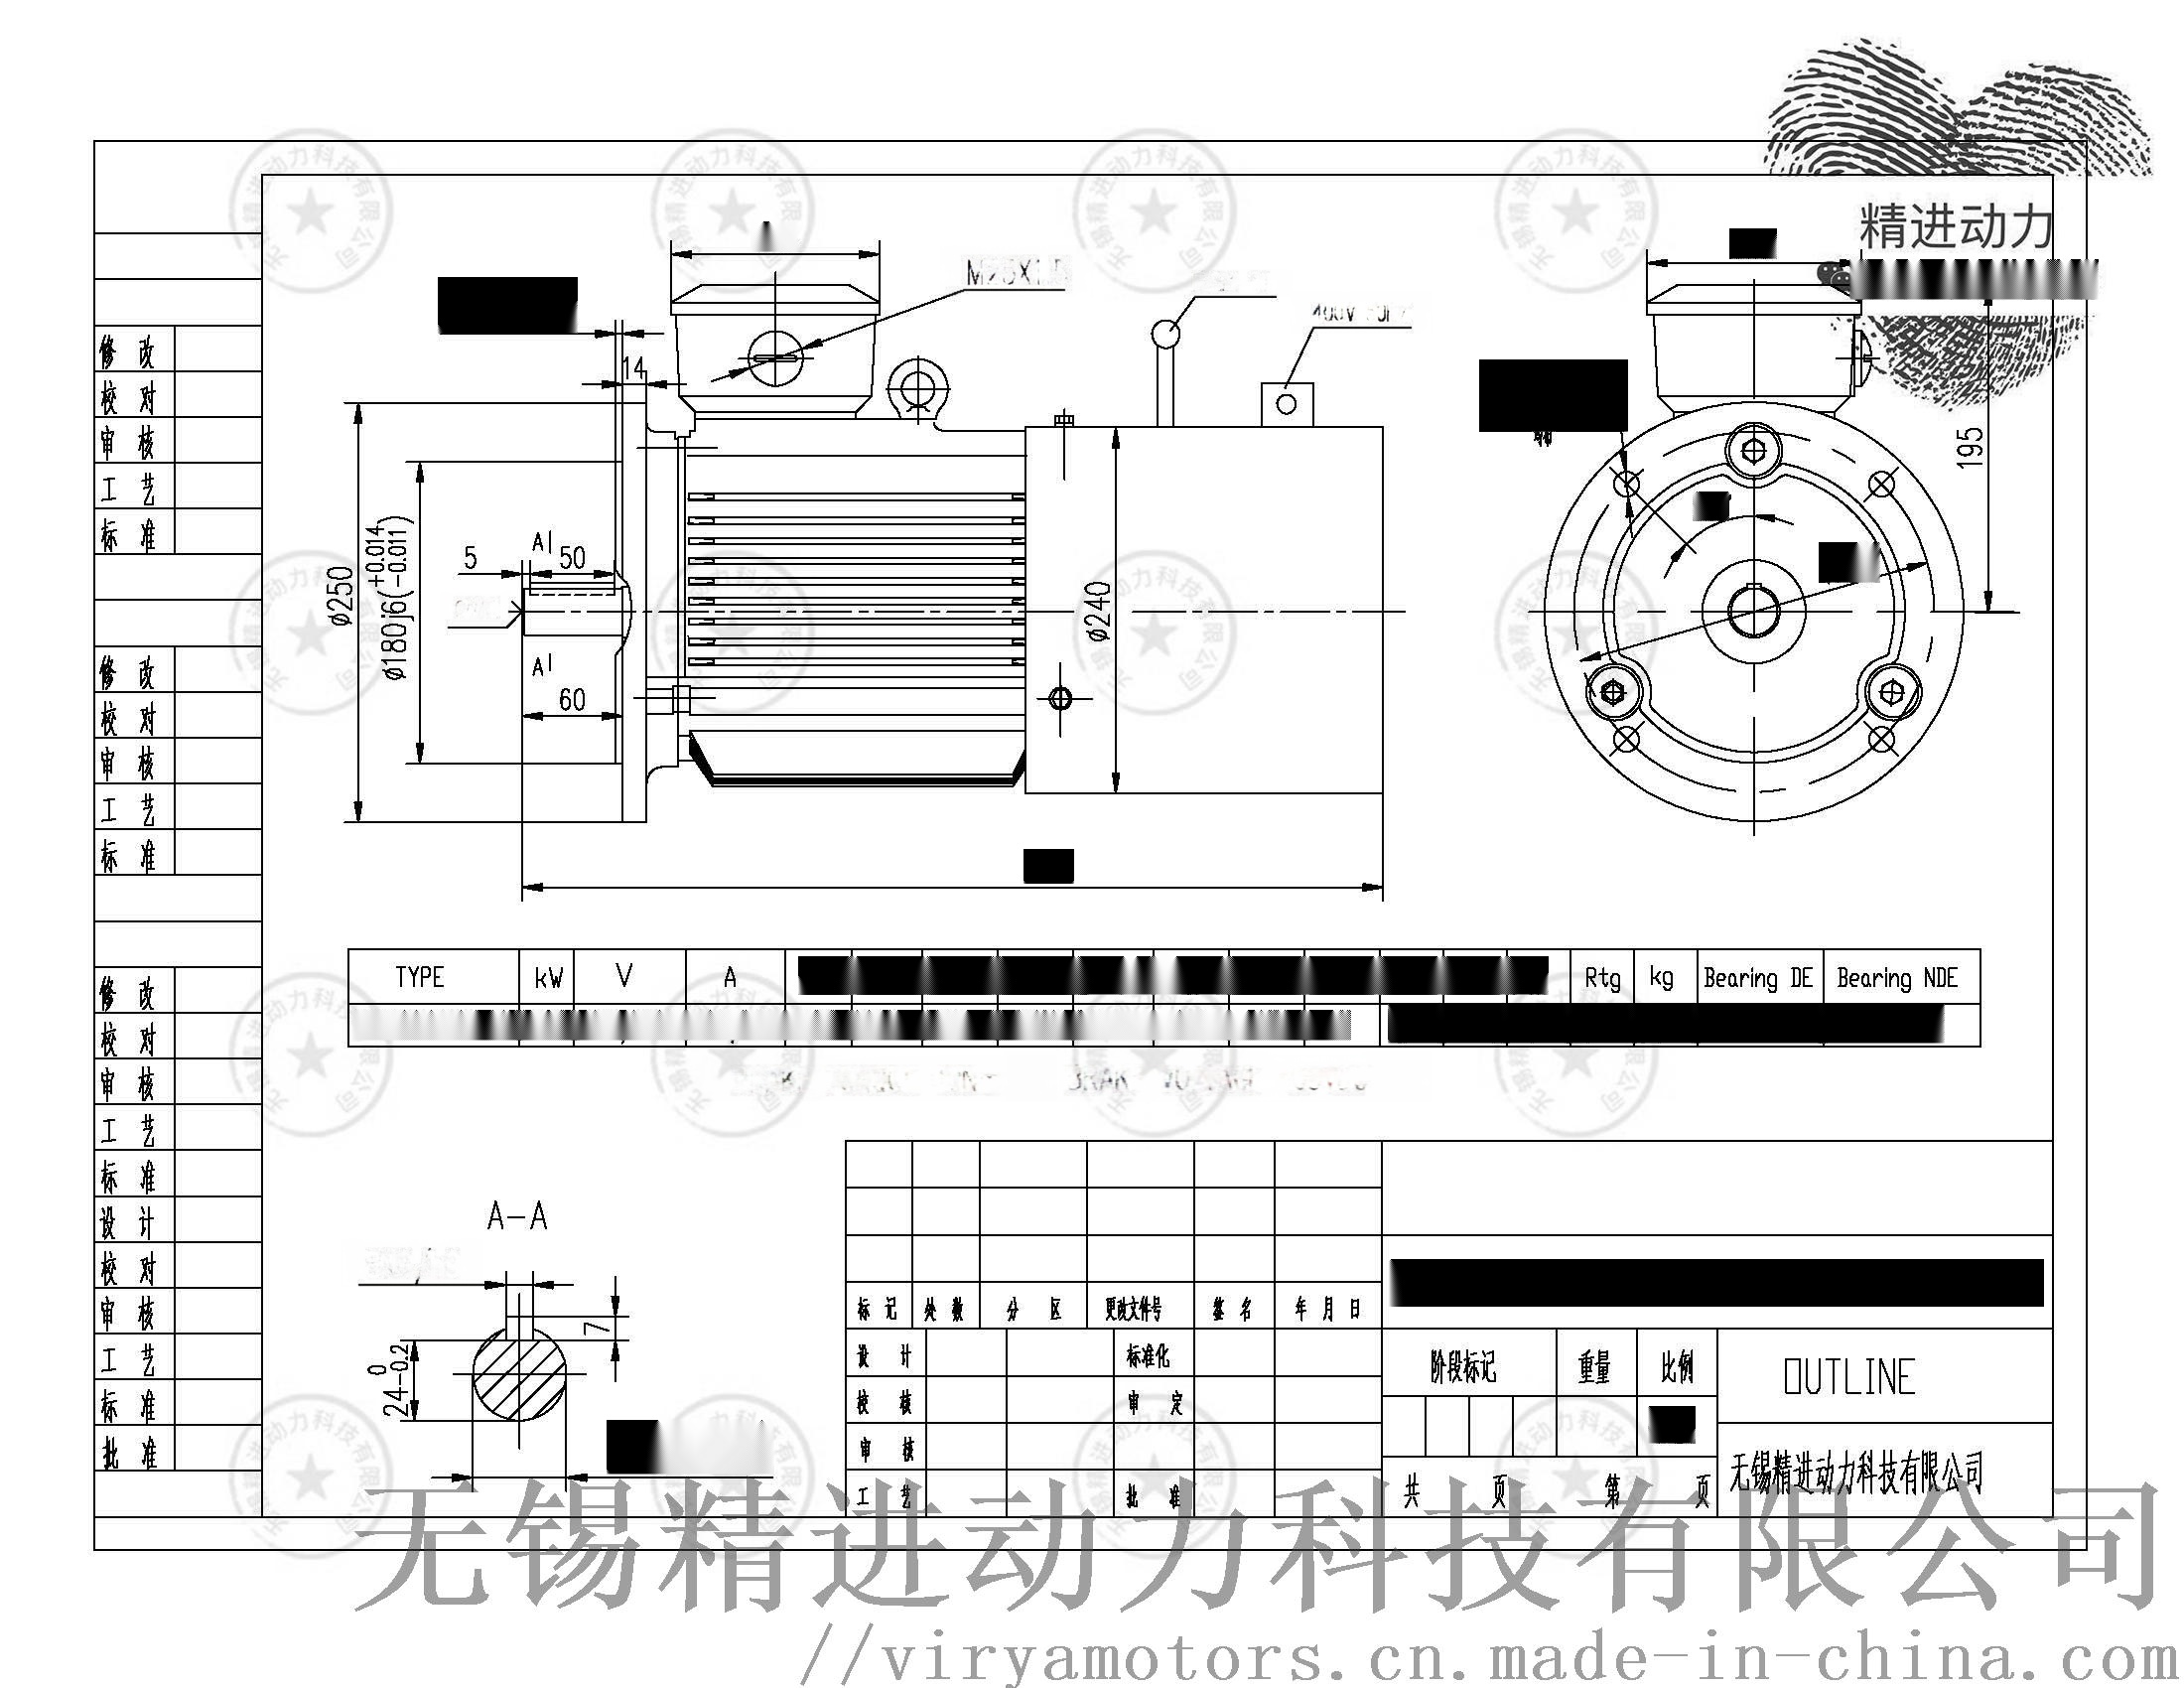 Y2VPEJ 112M-6-2.2kW B5 400-690V 50HZ.jpg